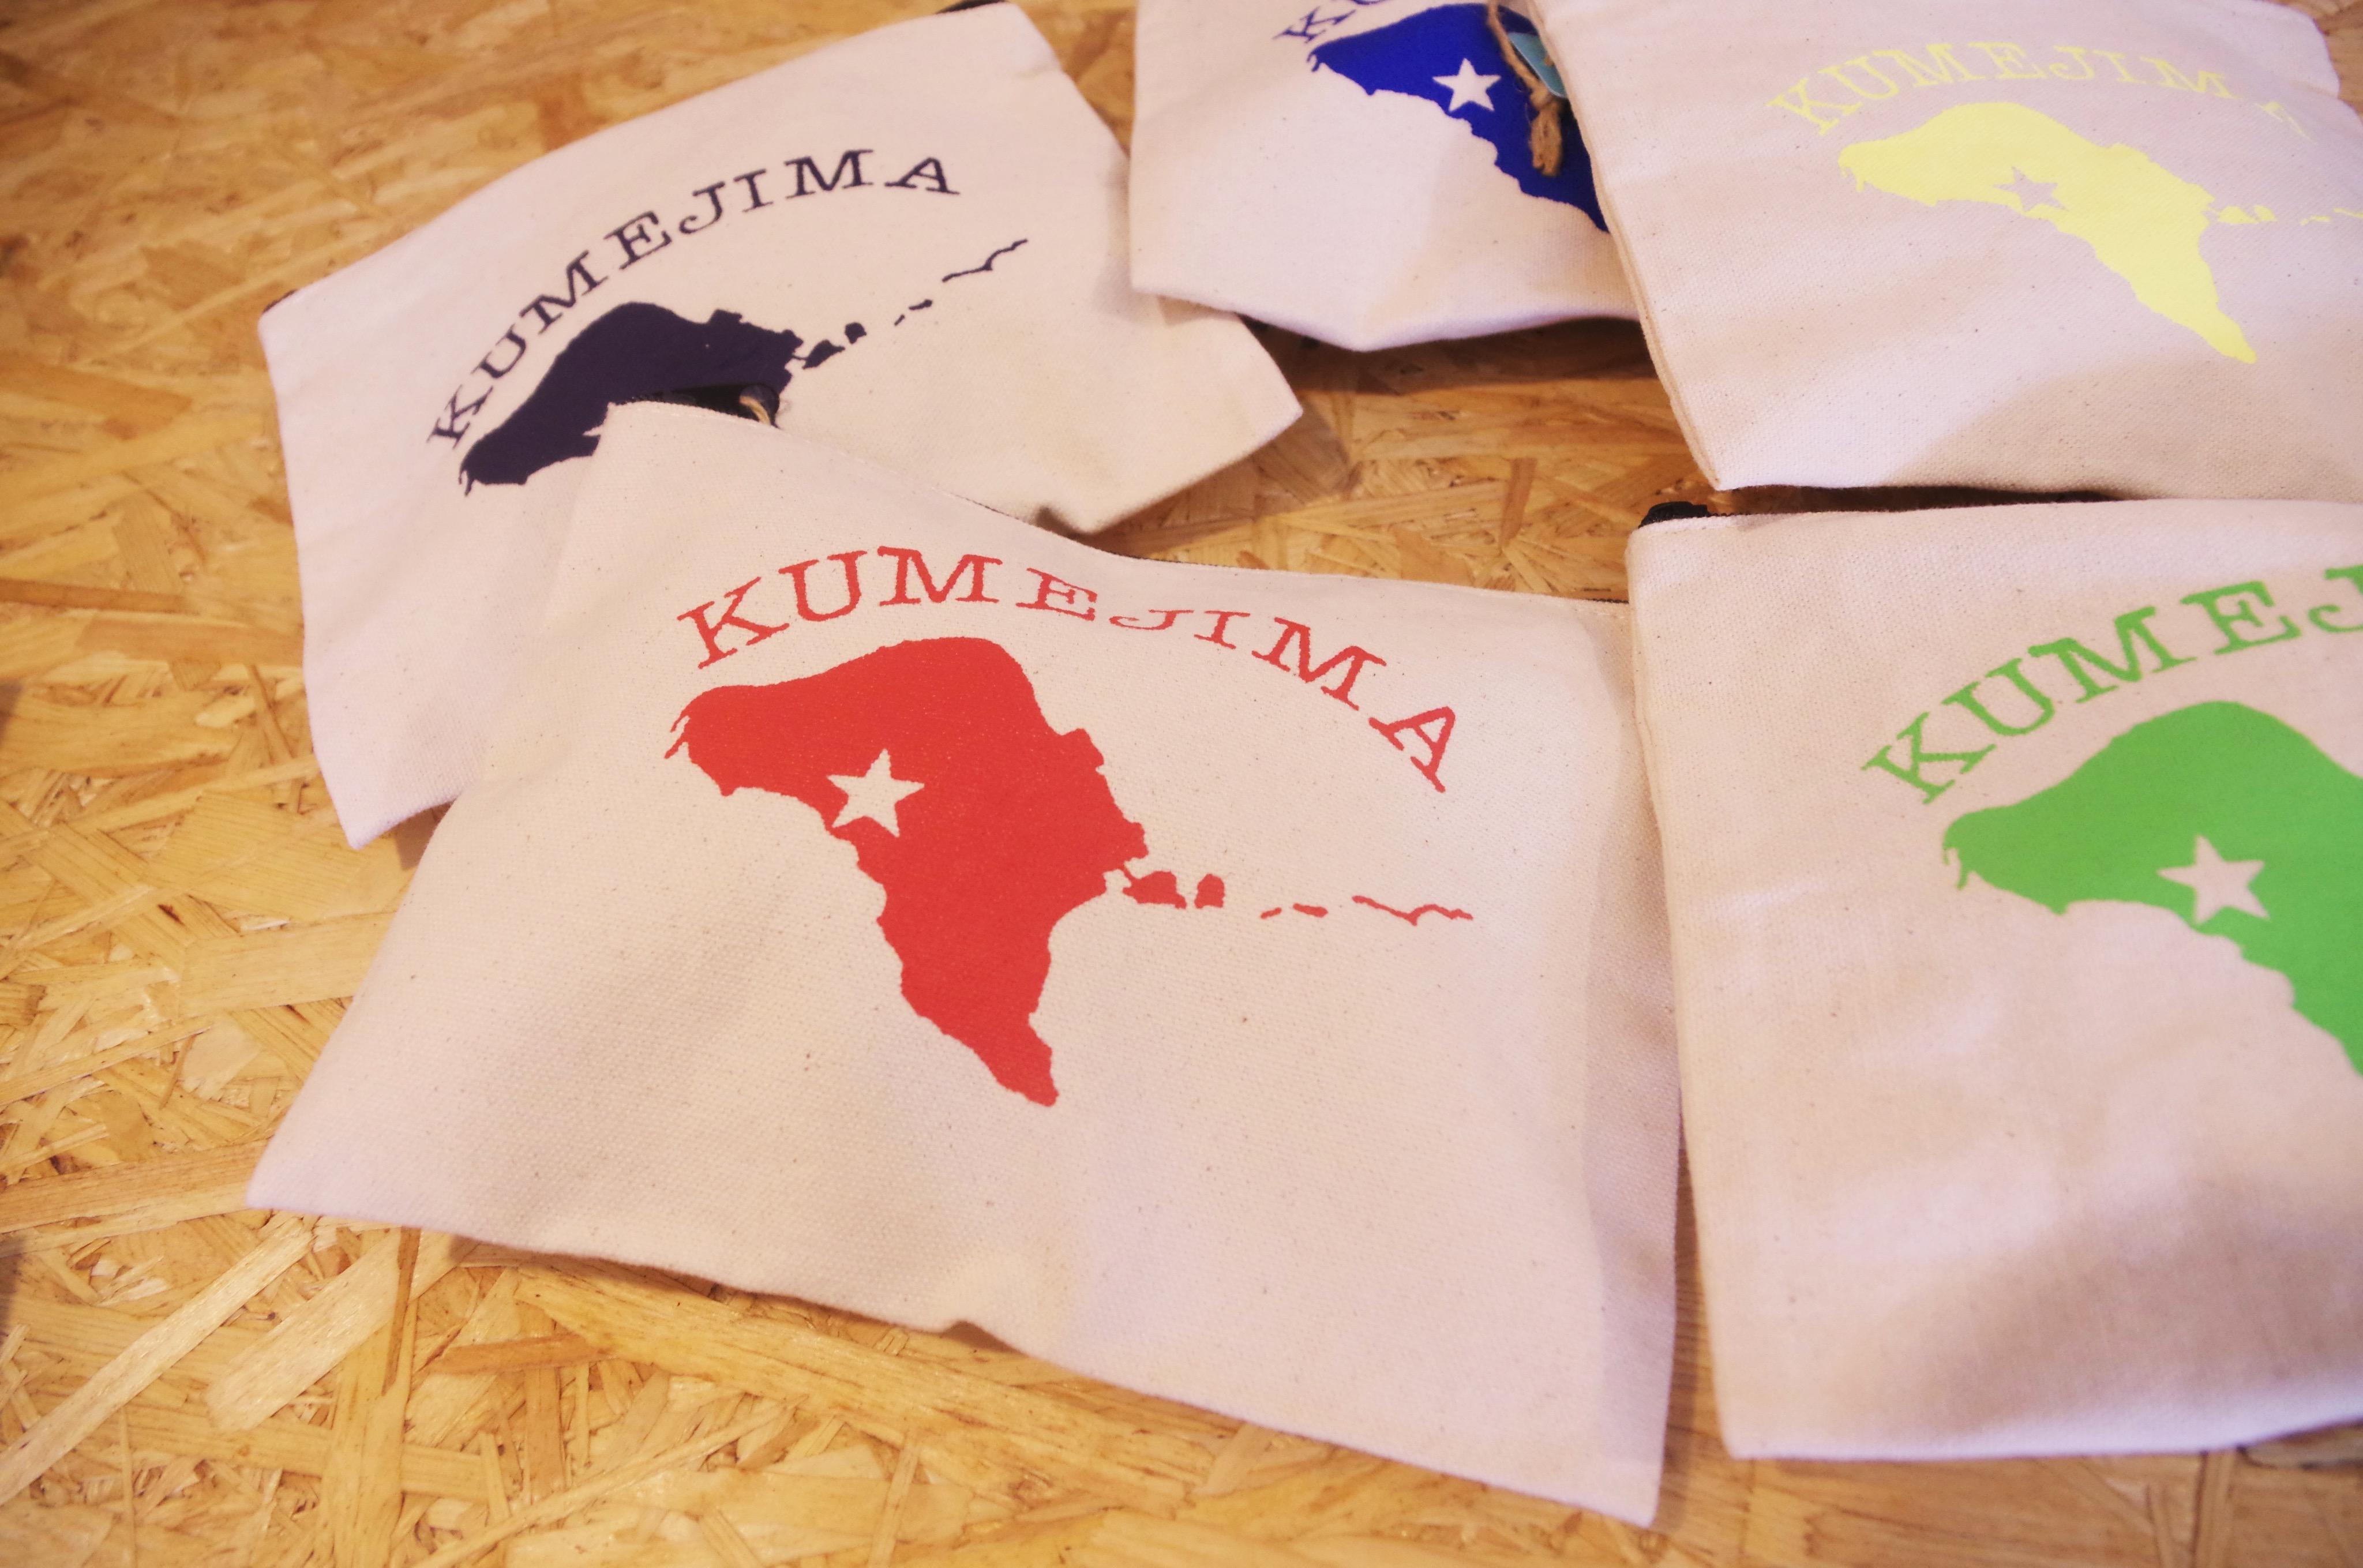 kumejima shirtsオリジナルポーチ